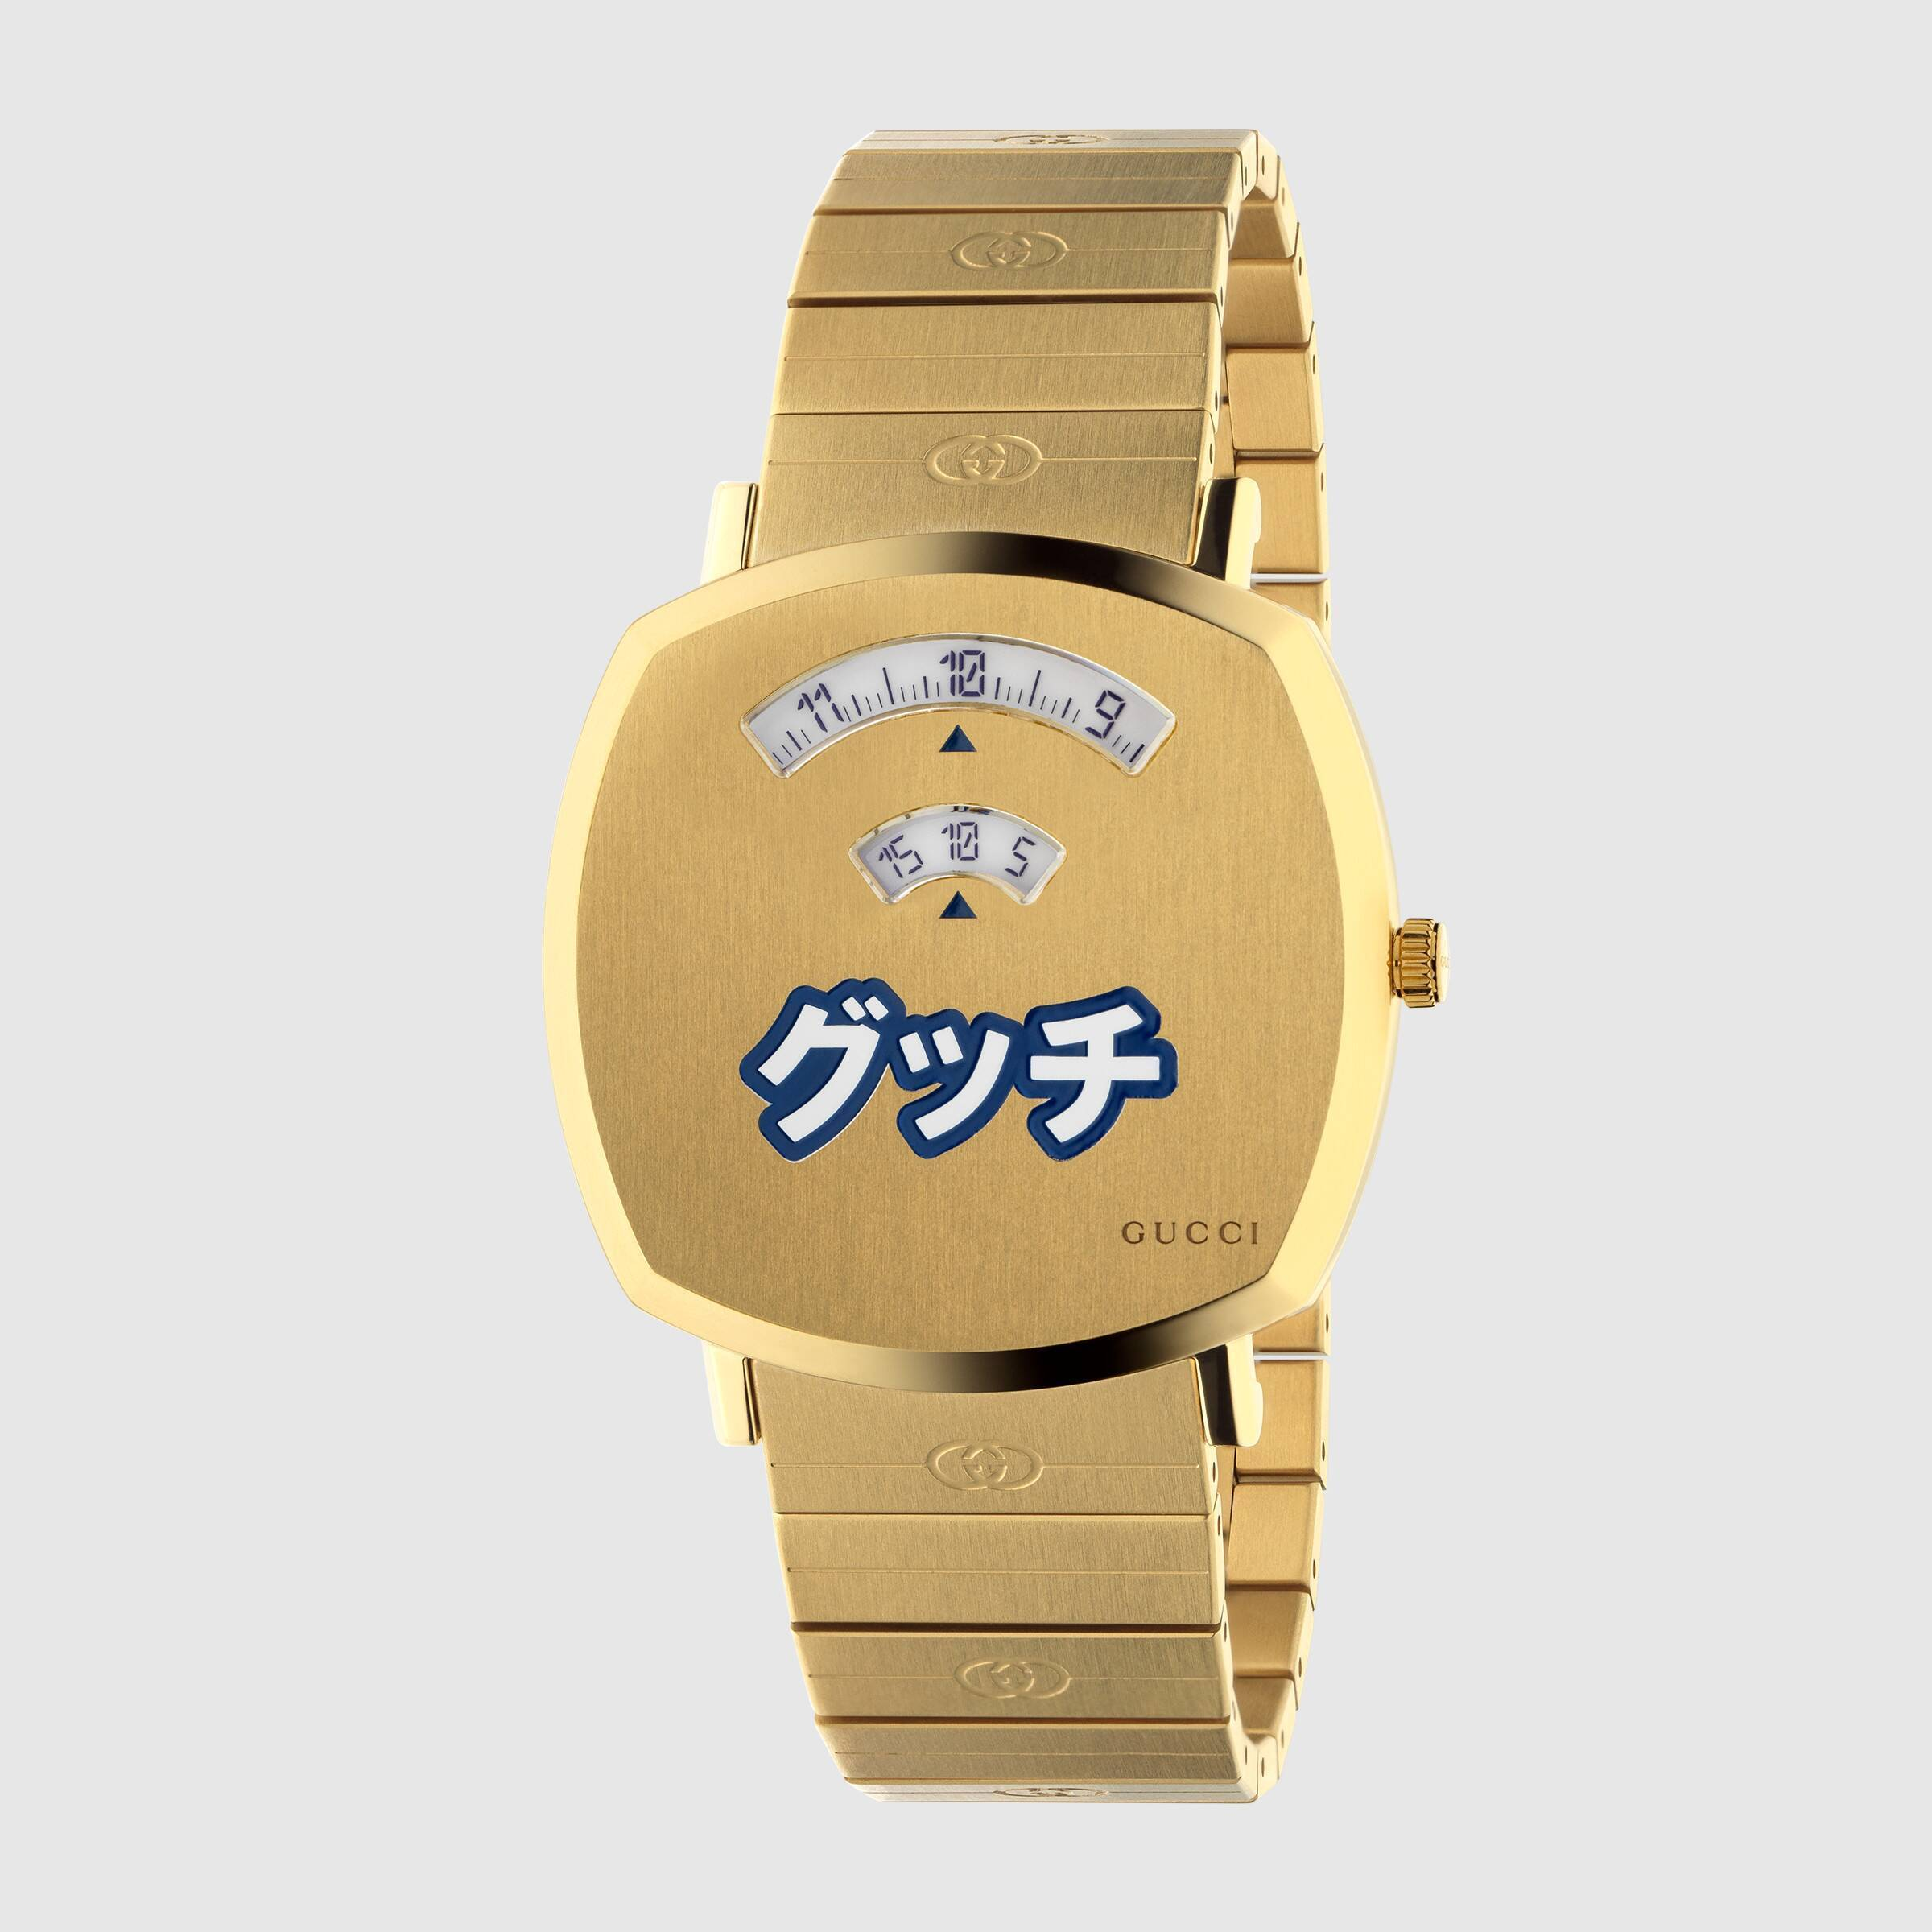 Japan Exclusive Grip watch, 38mm